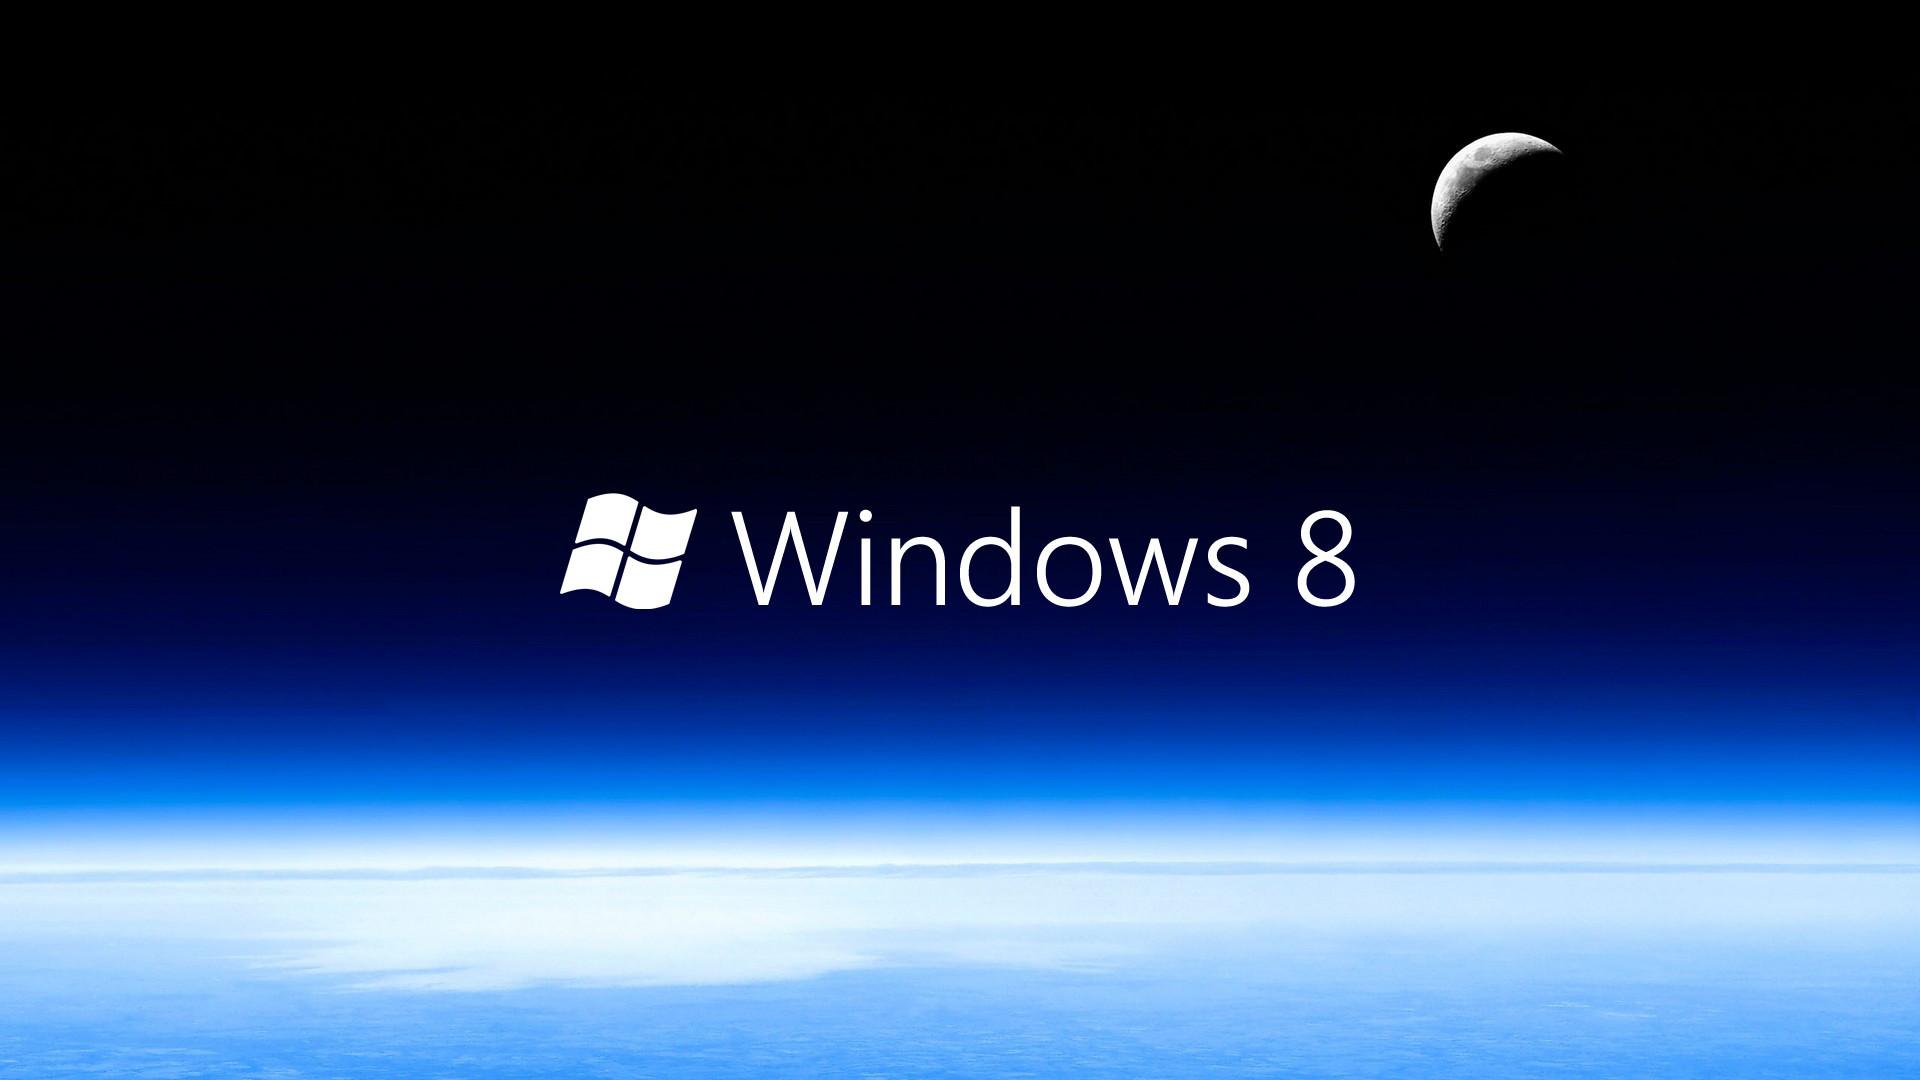 windows 8 wallpaper 1920x1080 (78+ pictures)